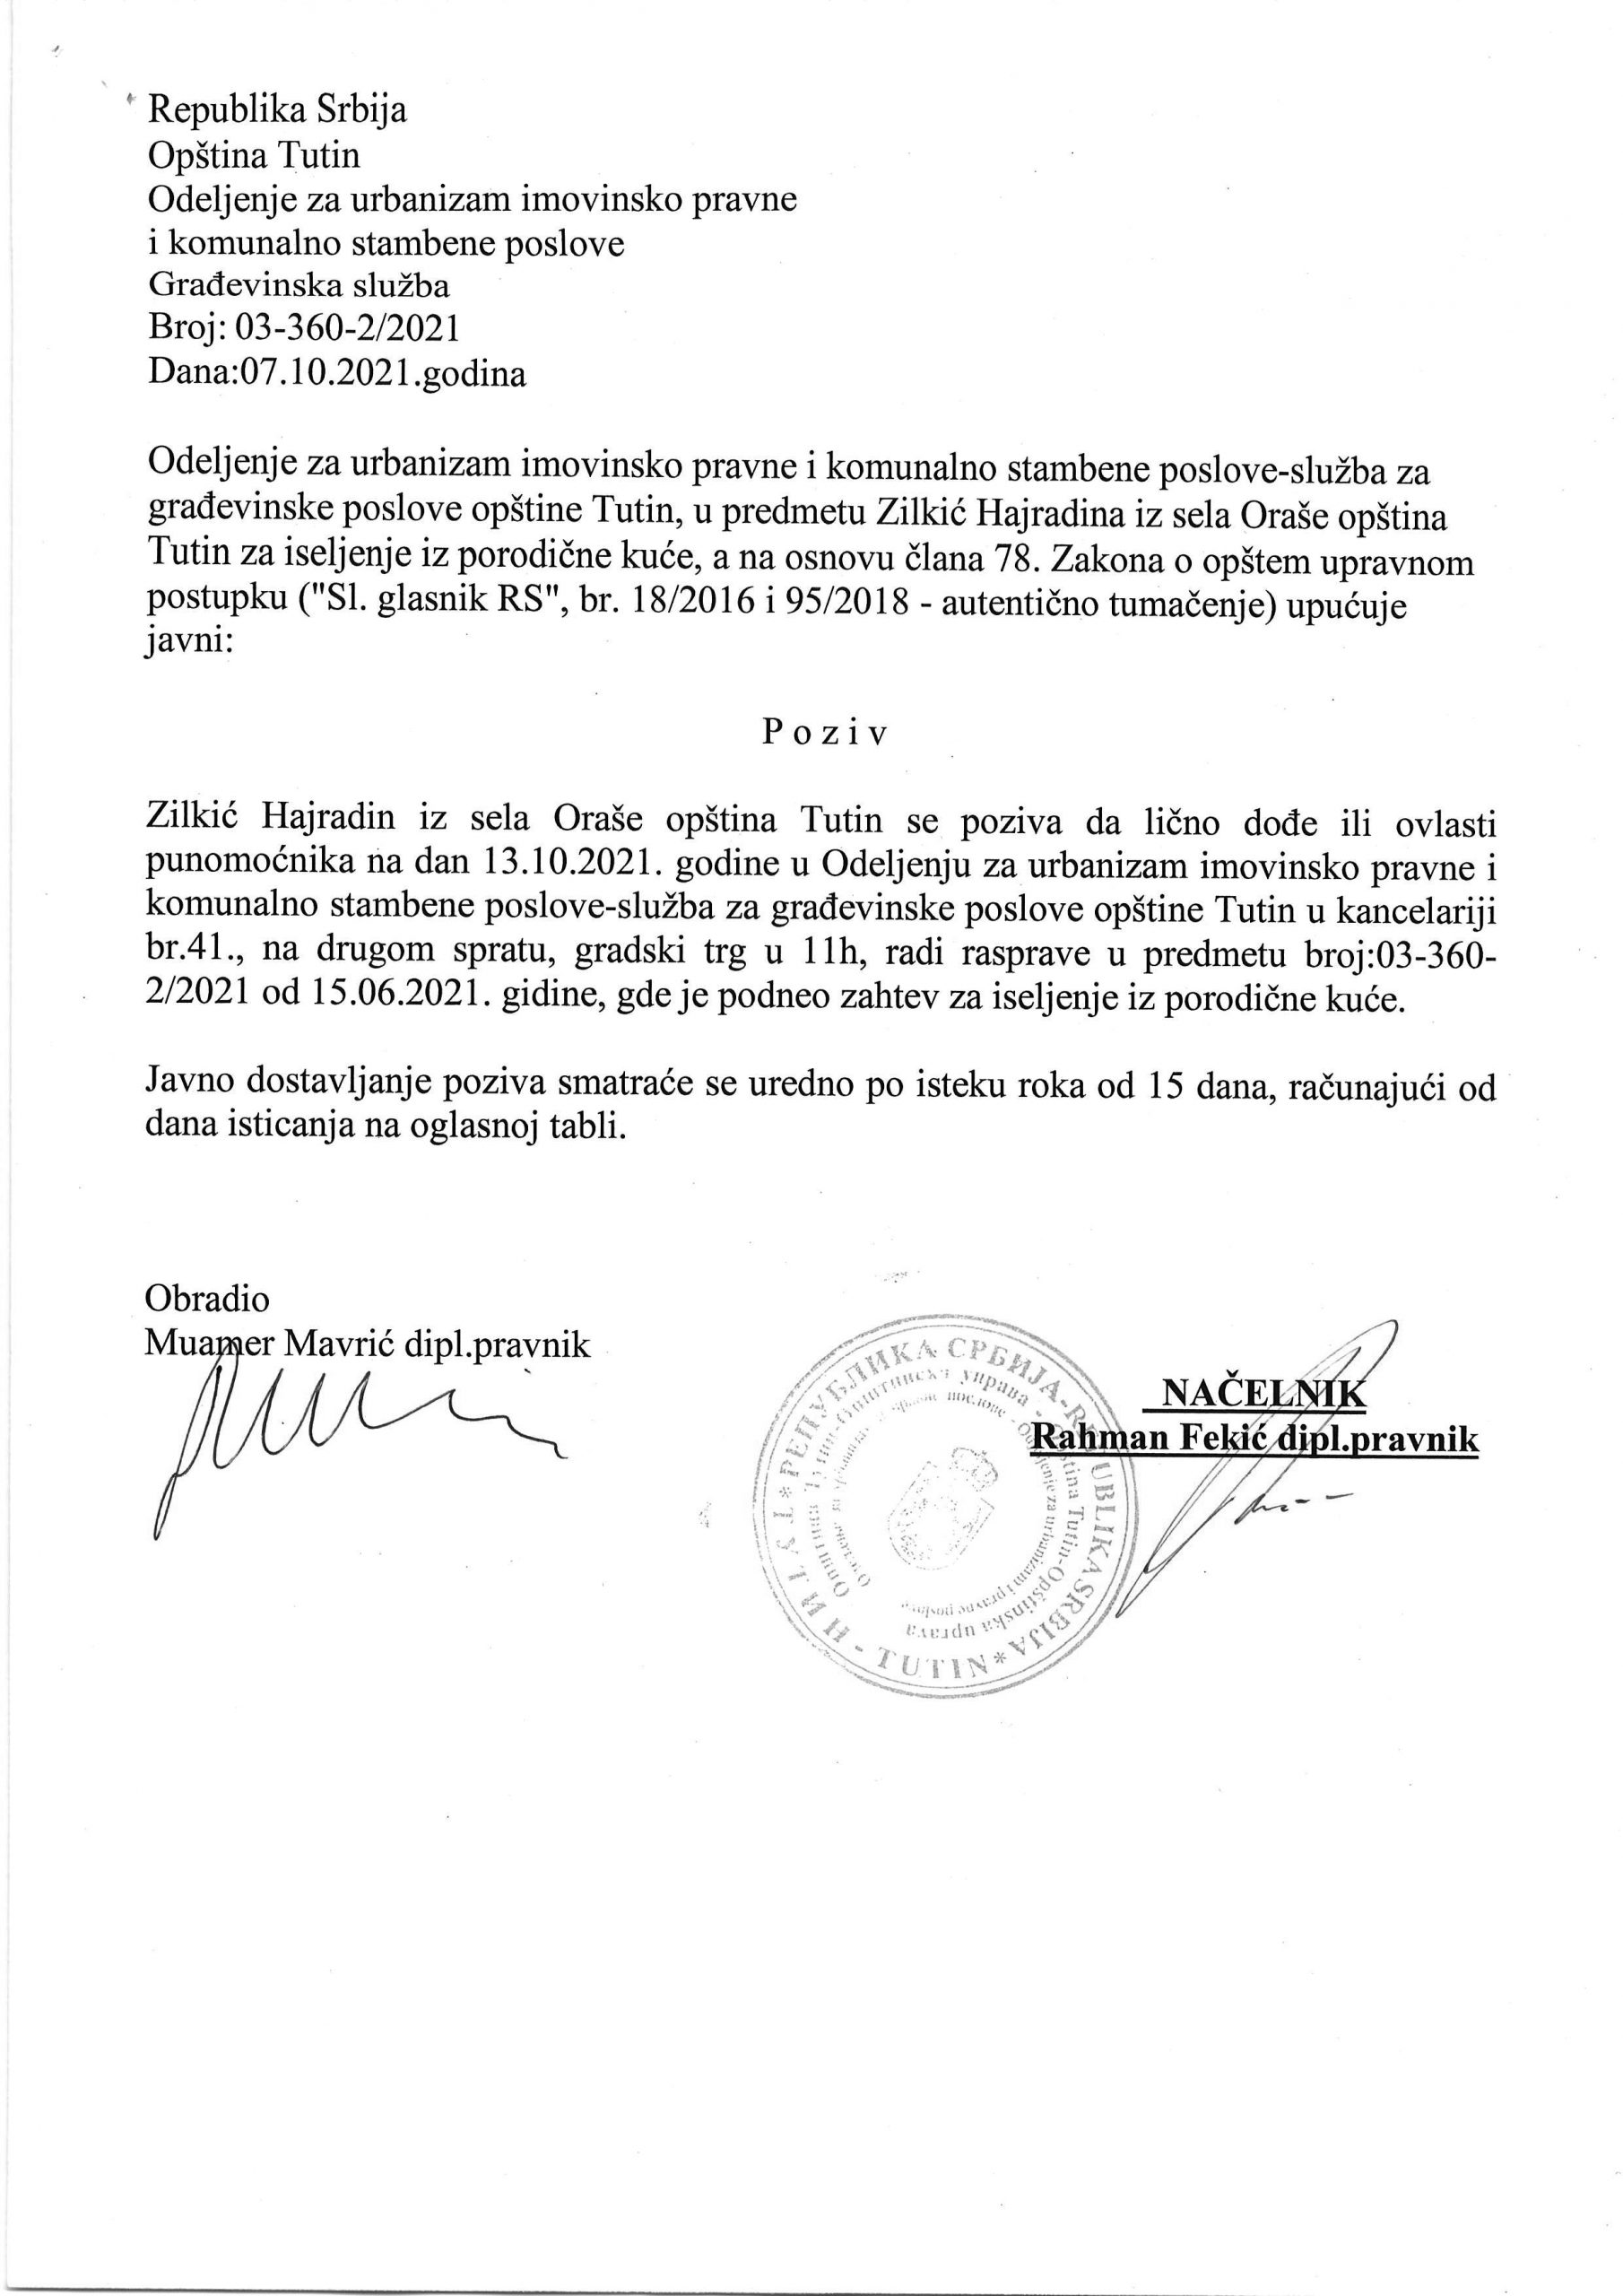 Poziv Zilkić Hajradin